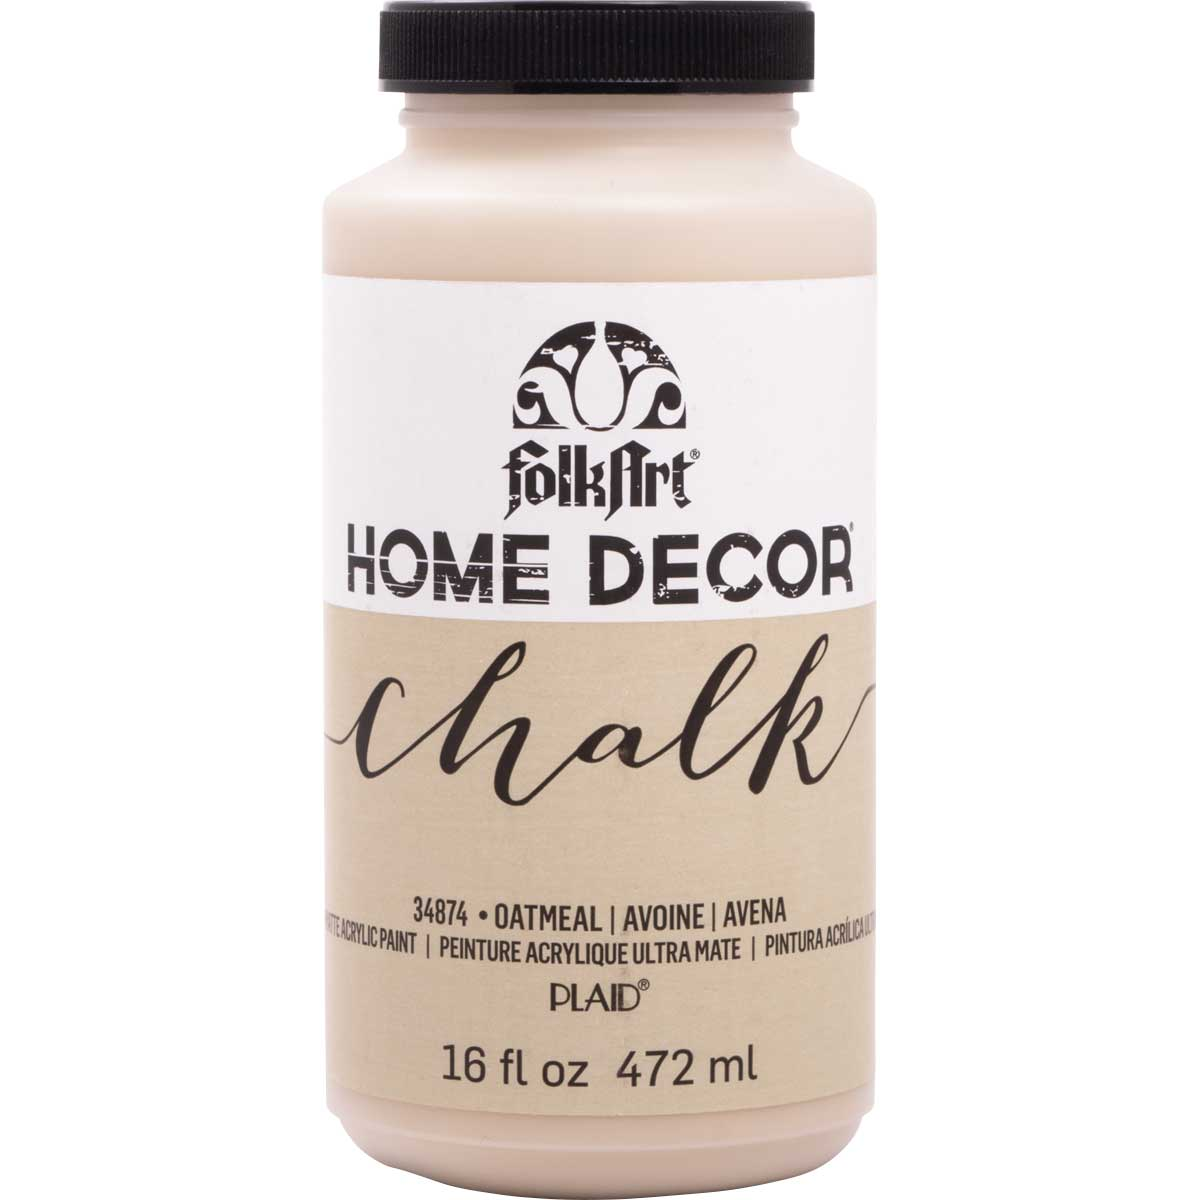 FolkArt ® Home Decor™ Chalk - Oatmeal, 16 oz. - 34874